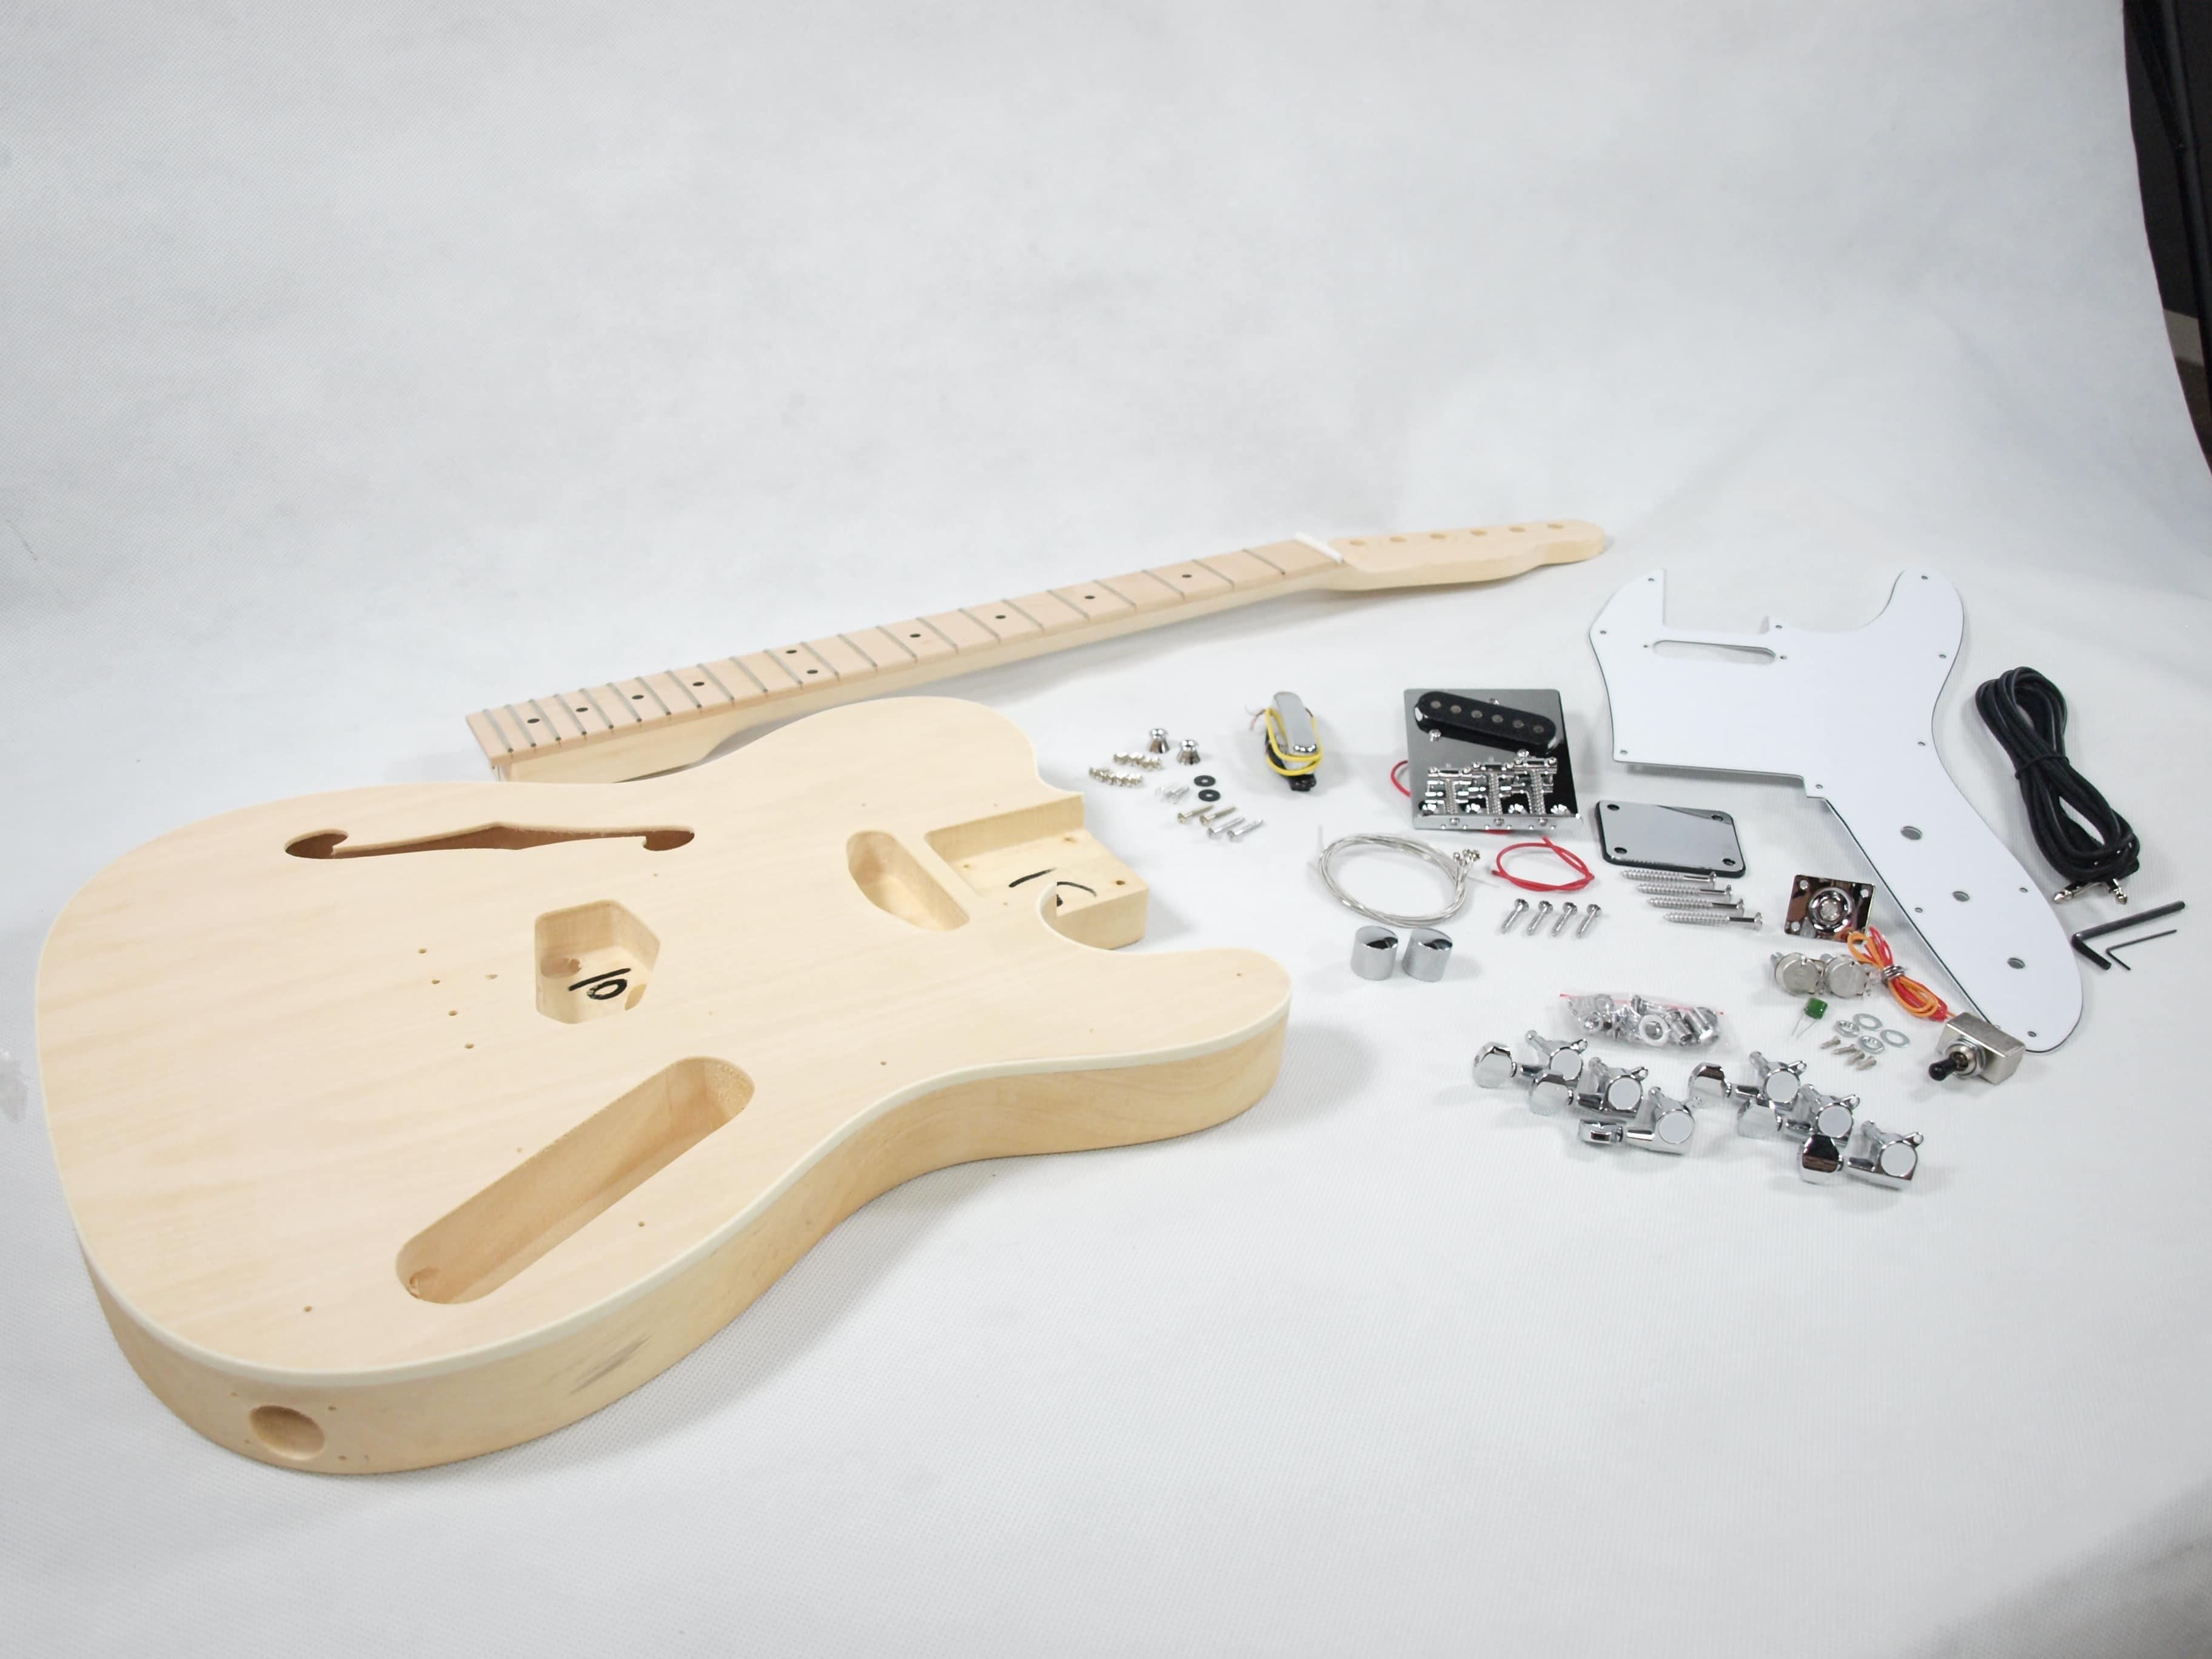 Alston Guitar Kit Wiring Diagram Auto Electrical Pioneer Deh 2200ub